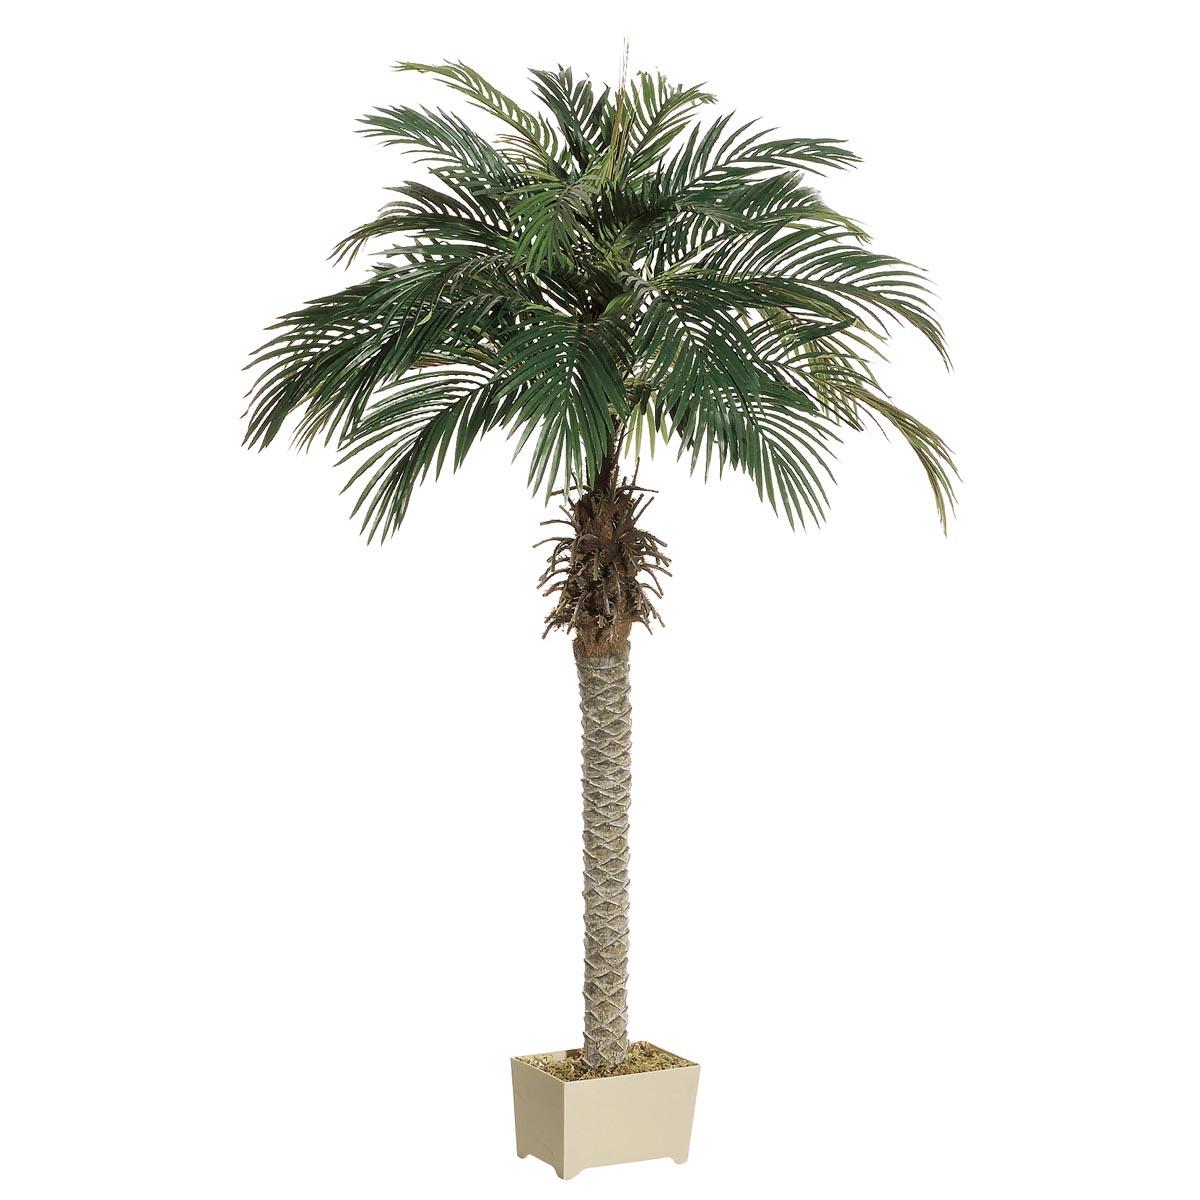 Artificial Outdoor Christmas Tree